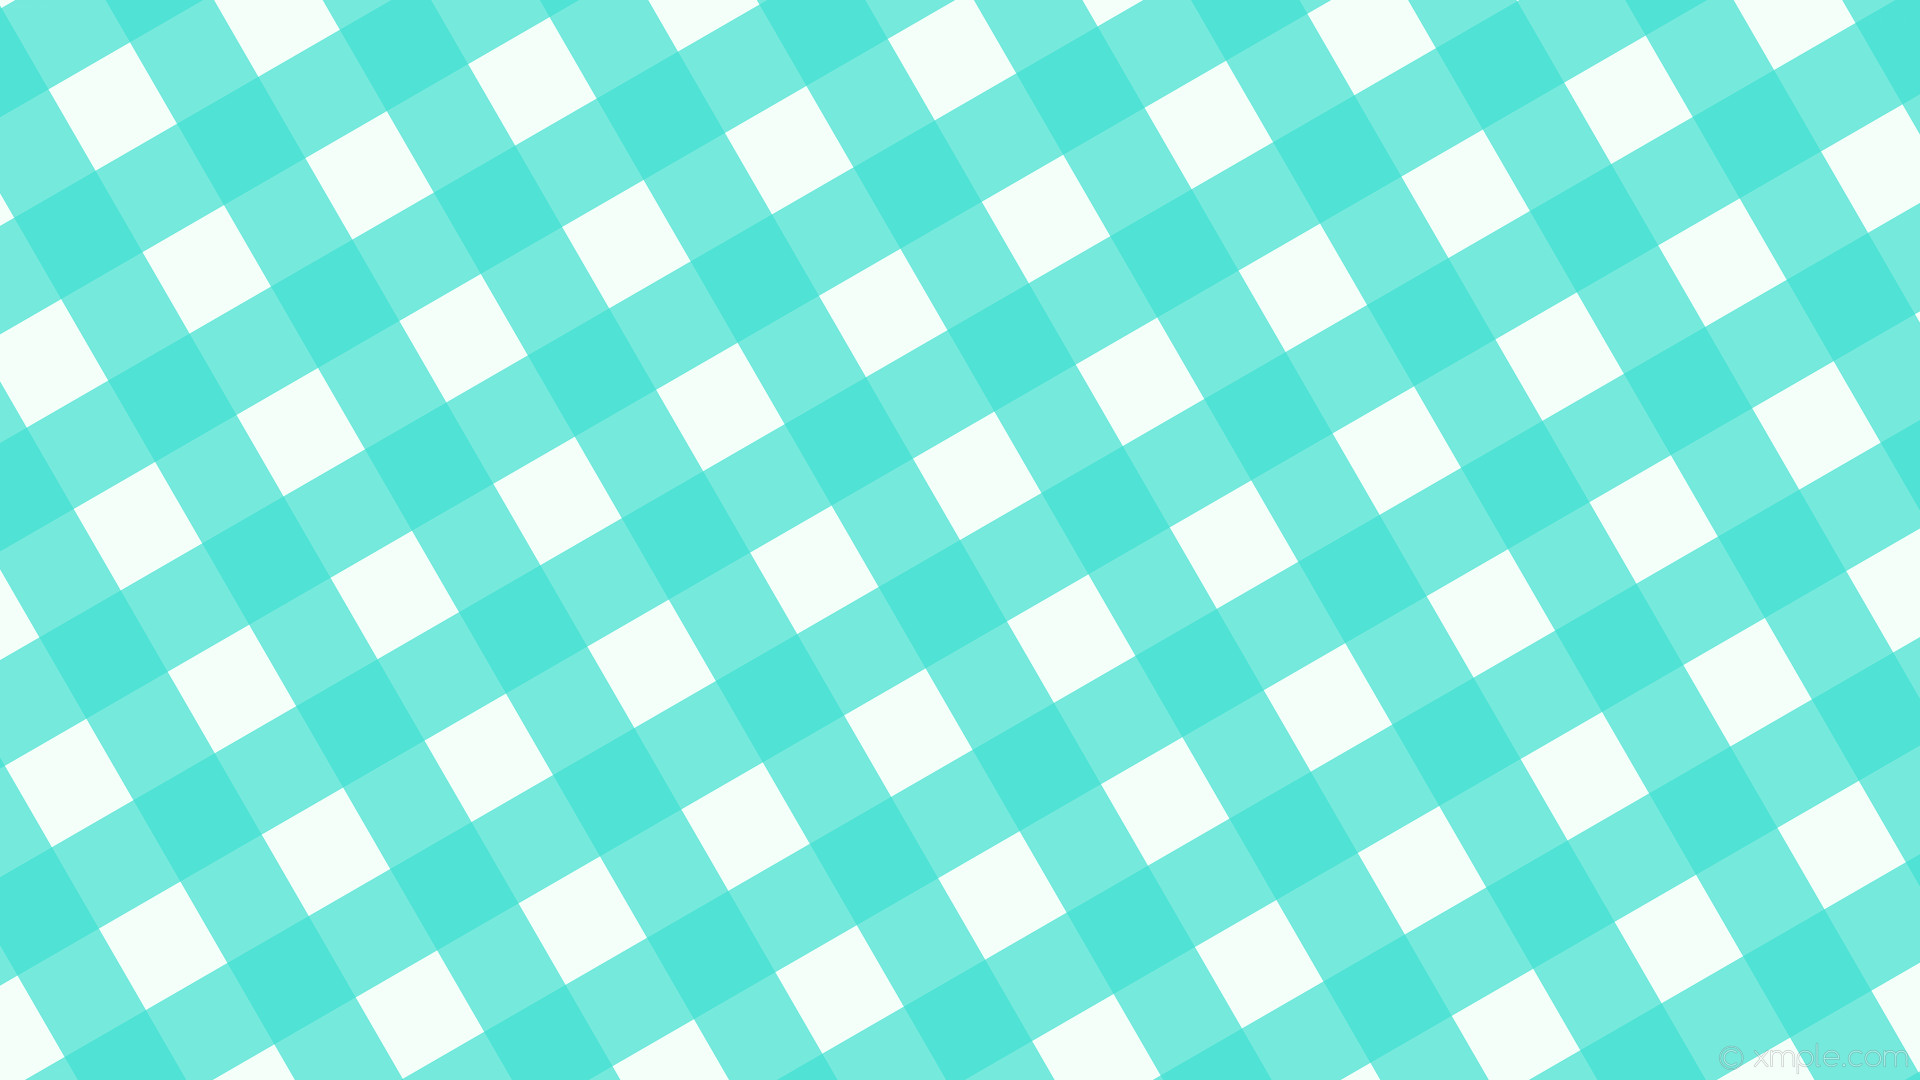 Children Wallpaper Kid Wallpaper Kid Blue Checker Wallpaper Wallpaper Stripe Wallpaper Striped Wallpaper Checkered Wallpaper